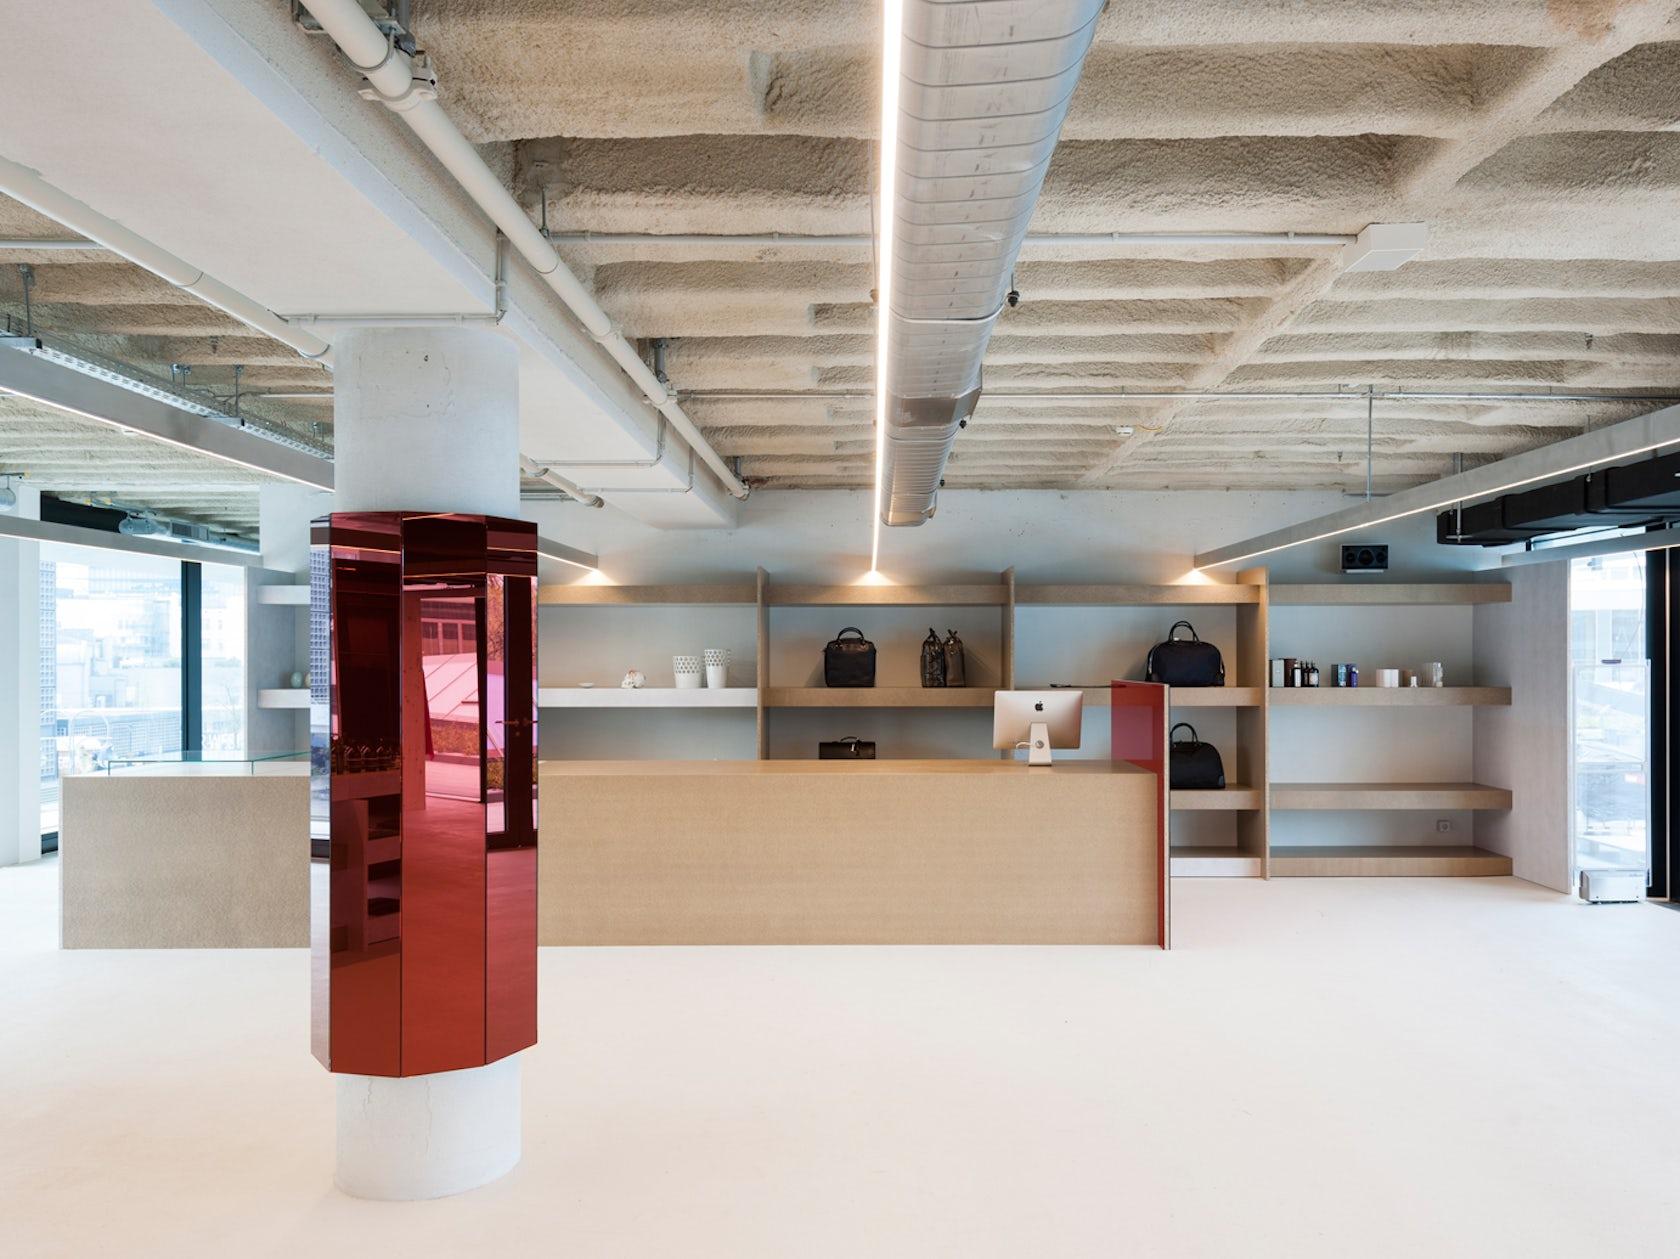 gonzalez haase aas architizer. Black Bedroom Furniture Sets. Home Design Ideas